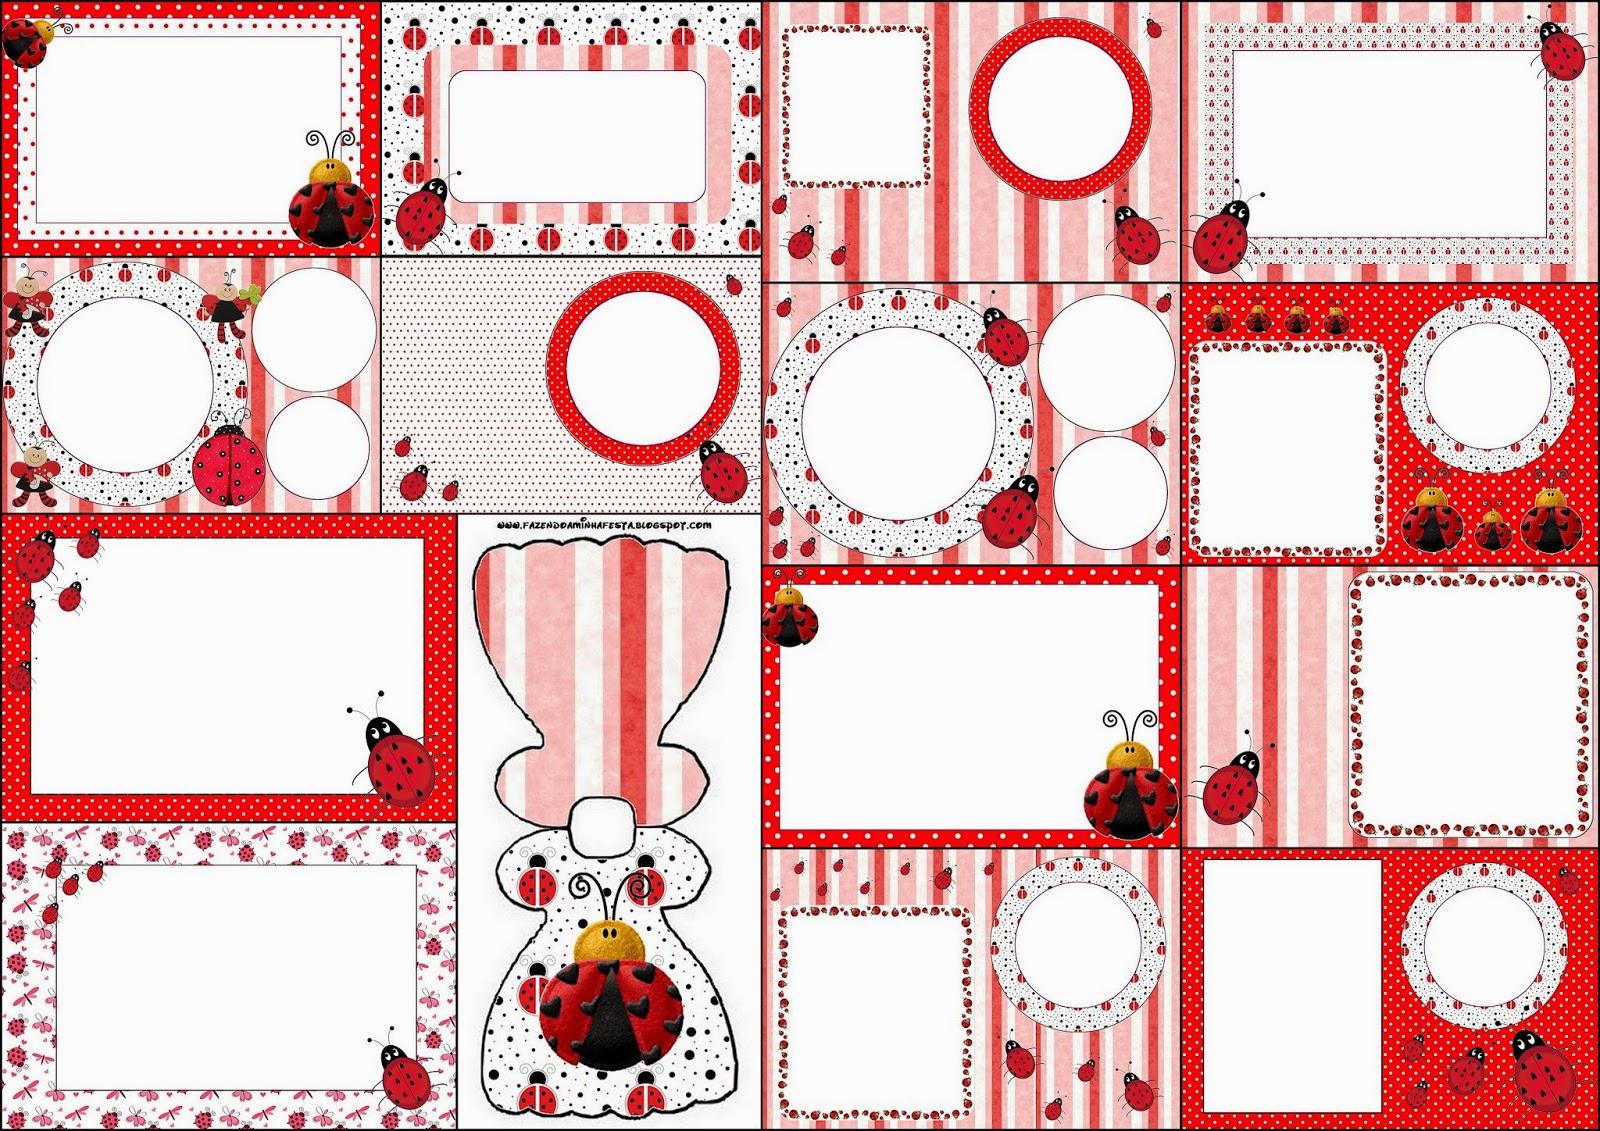 Ladybugs: Free Printable Invitations. | Oh My Fiesta! in english